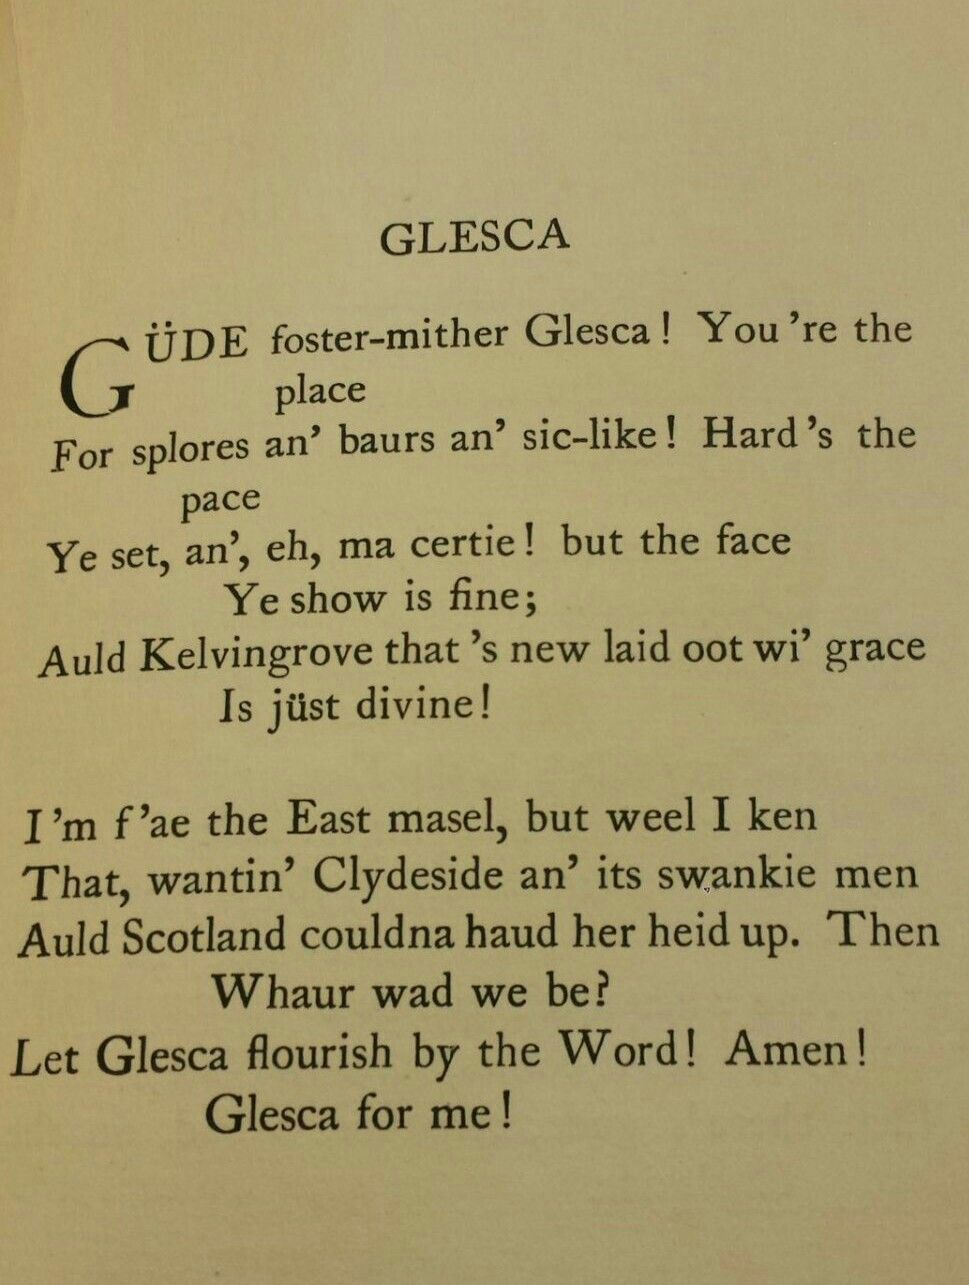 Glesca william douglas 1913 scottish sayings proverbs poems glesca william douglas 1913 kristyandbryce Choice Image